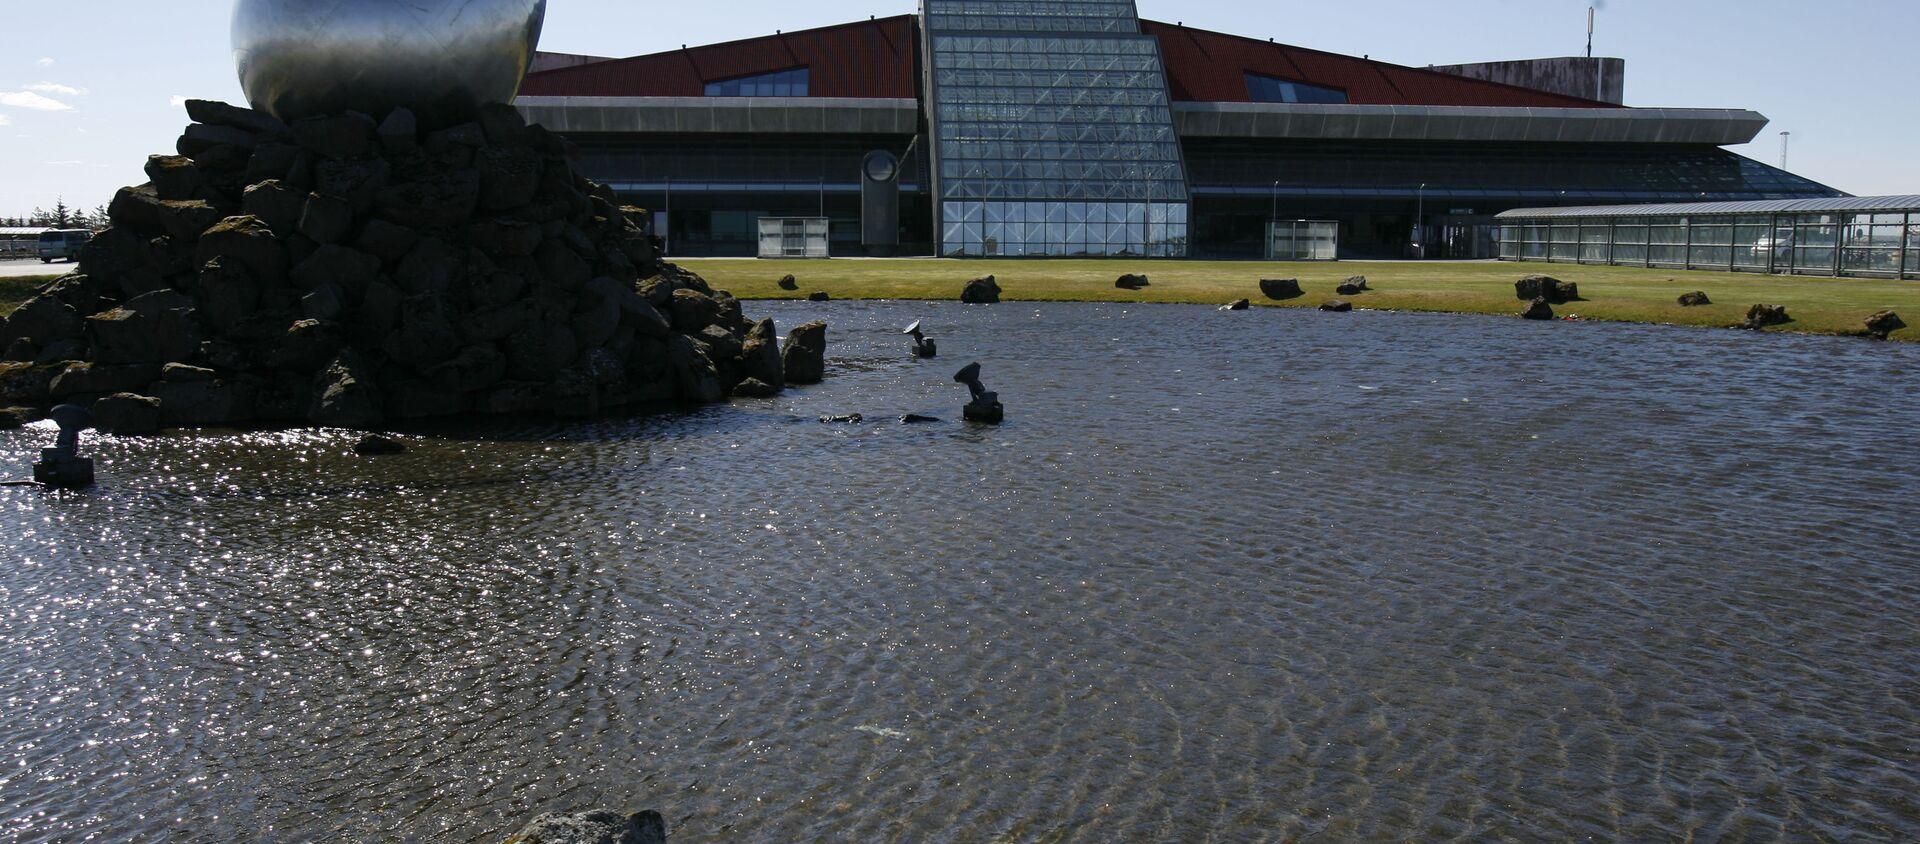 A general view of the exterior of Keflavik airport, Keflavik, Iceland  - Sputnik International, 1920, 18.03.2021